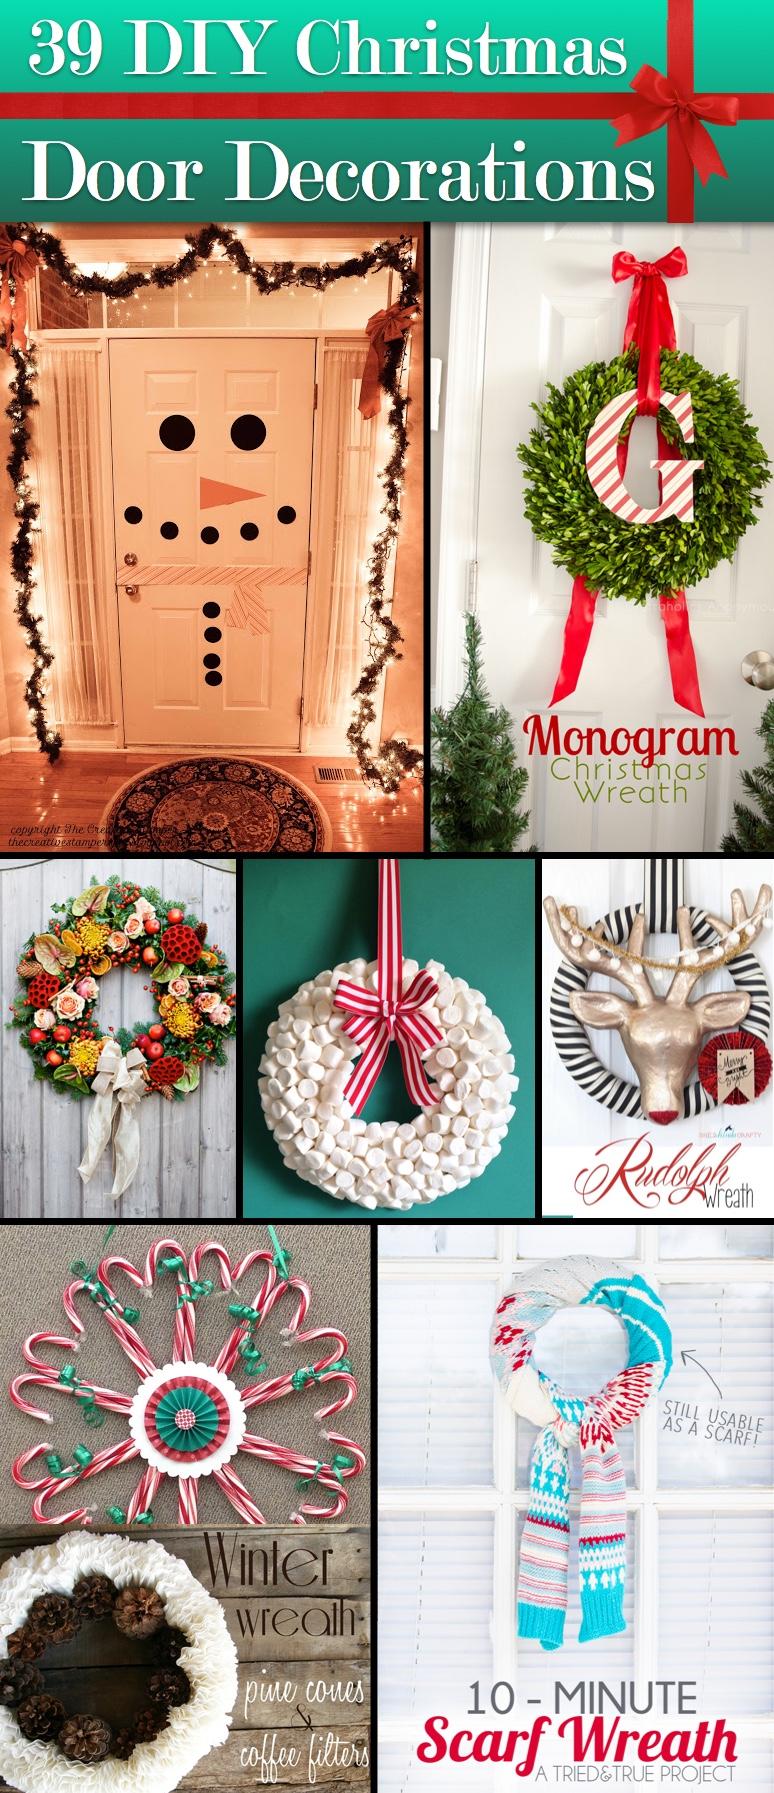 Christmas Door Decorations.39 Breathtaking Diy Christmas Door Decorations In 2015